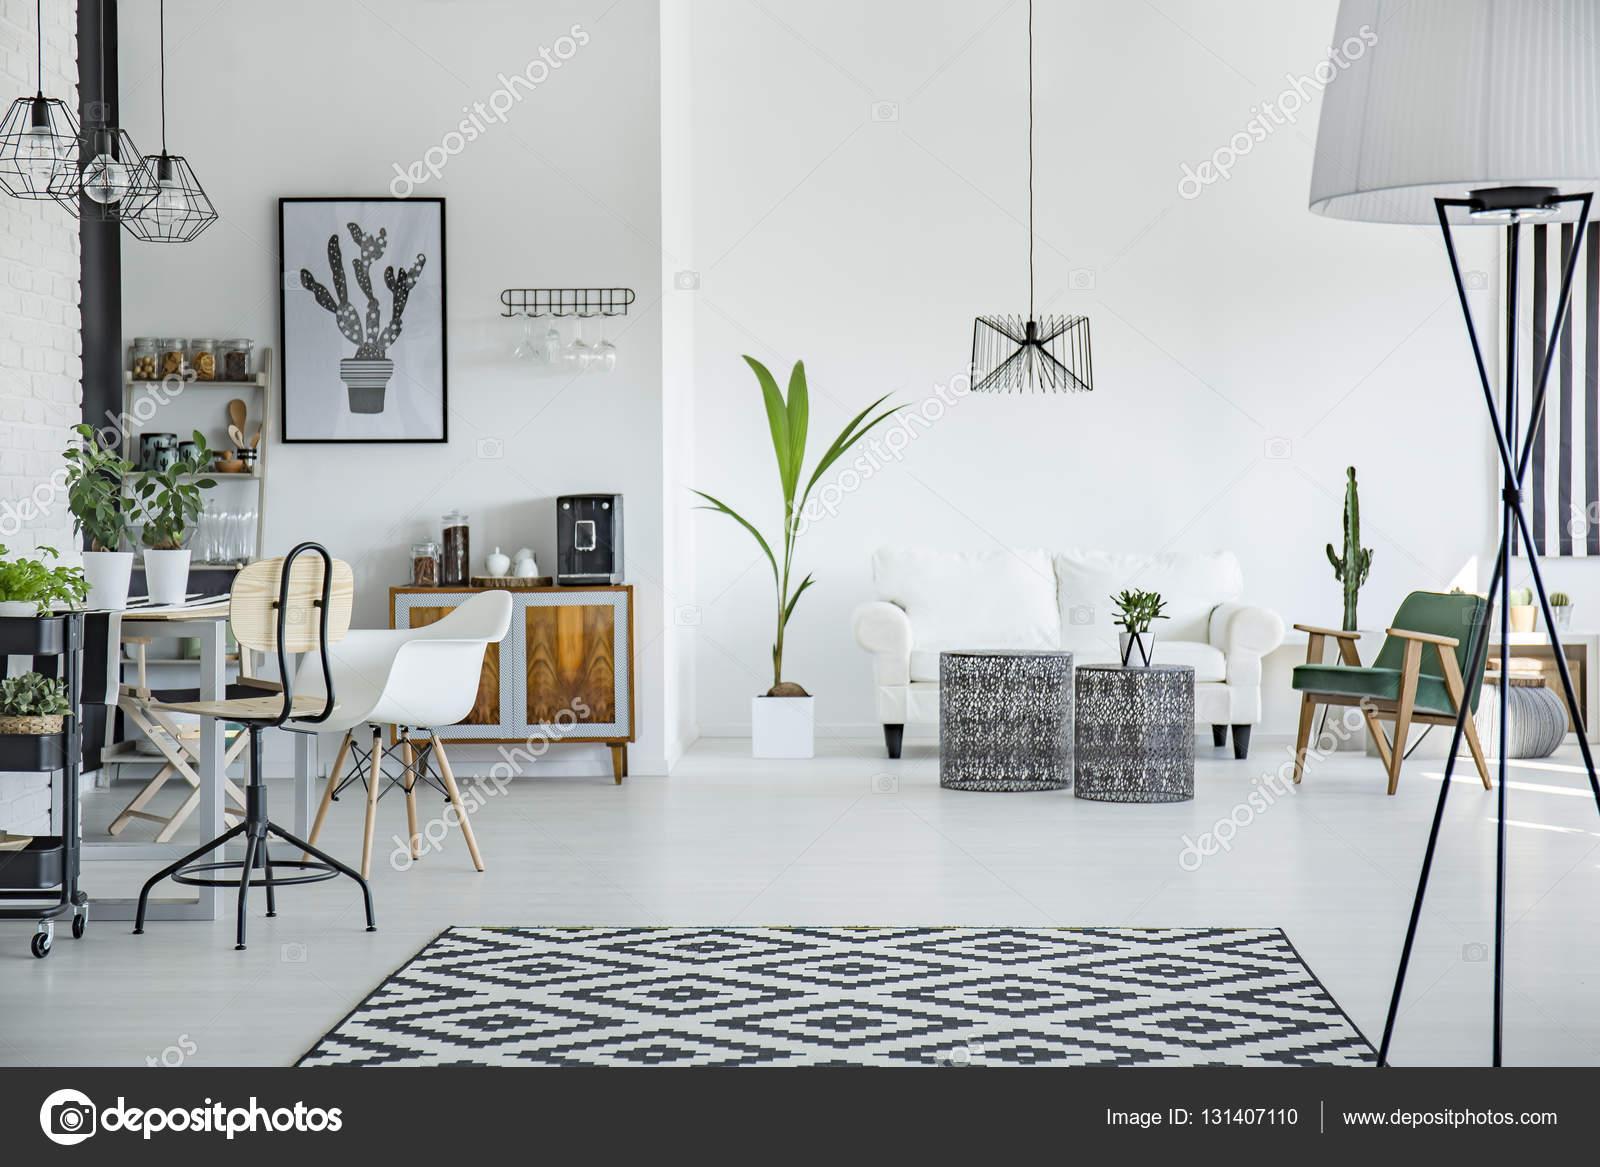 Loft interieur in scandinavische stijl stockfoto for Loft interieur